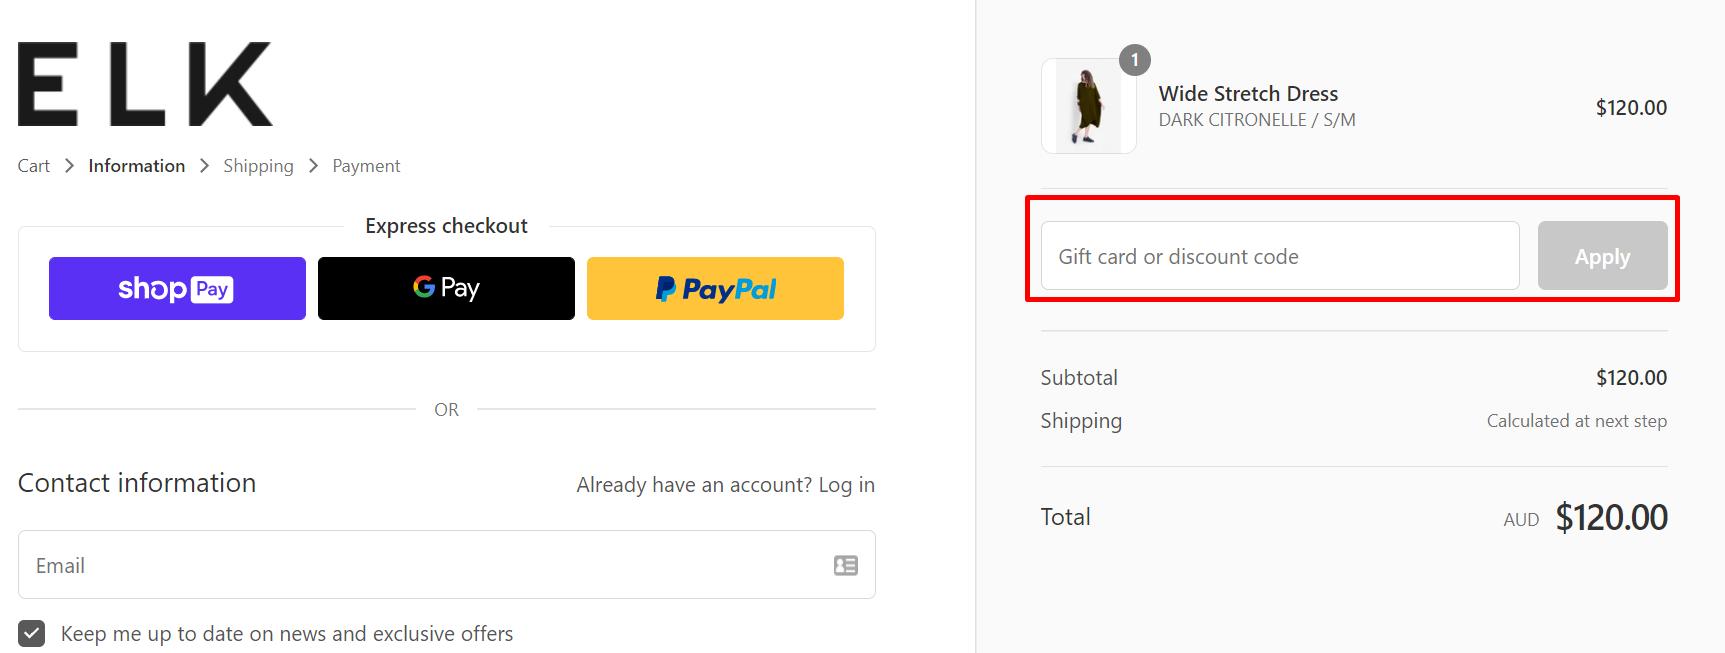 How do I use my ELK discount code?